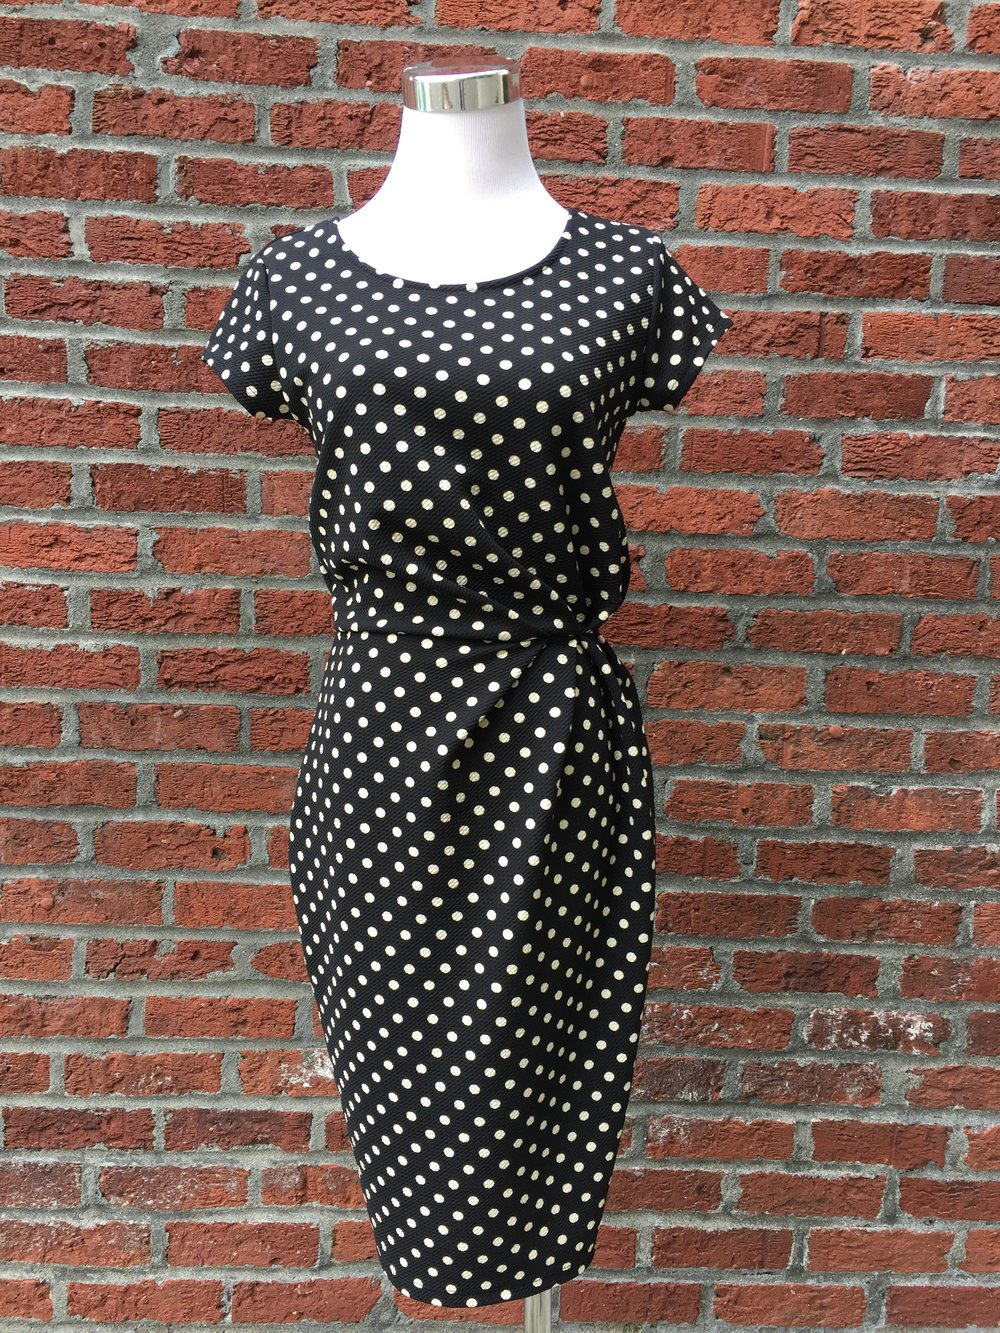 Cinched Polka Dot Dress